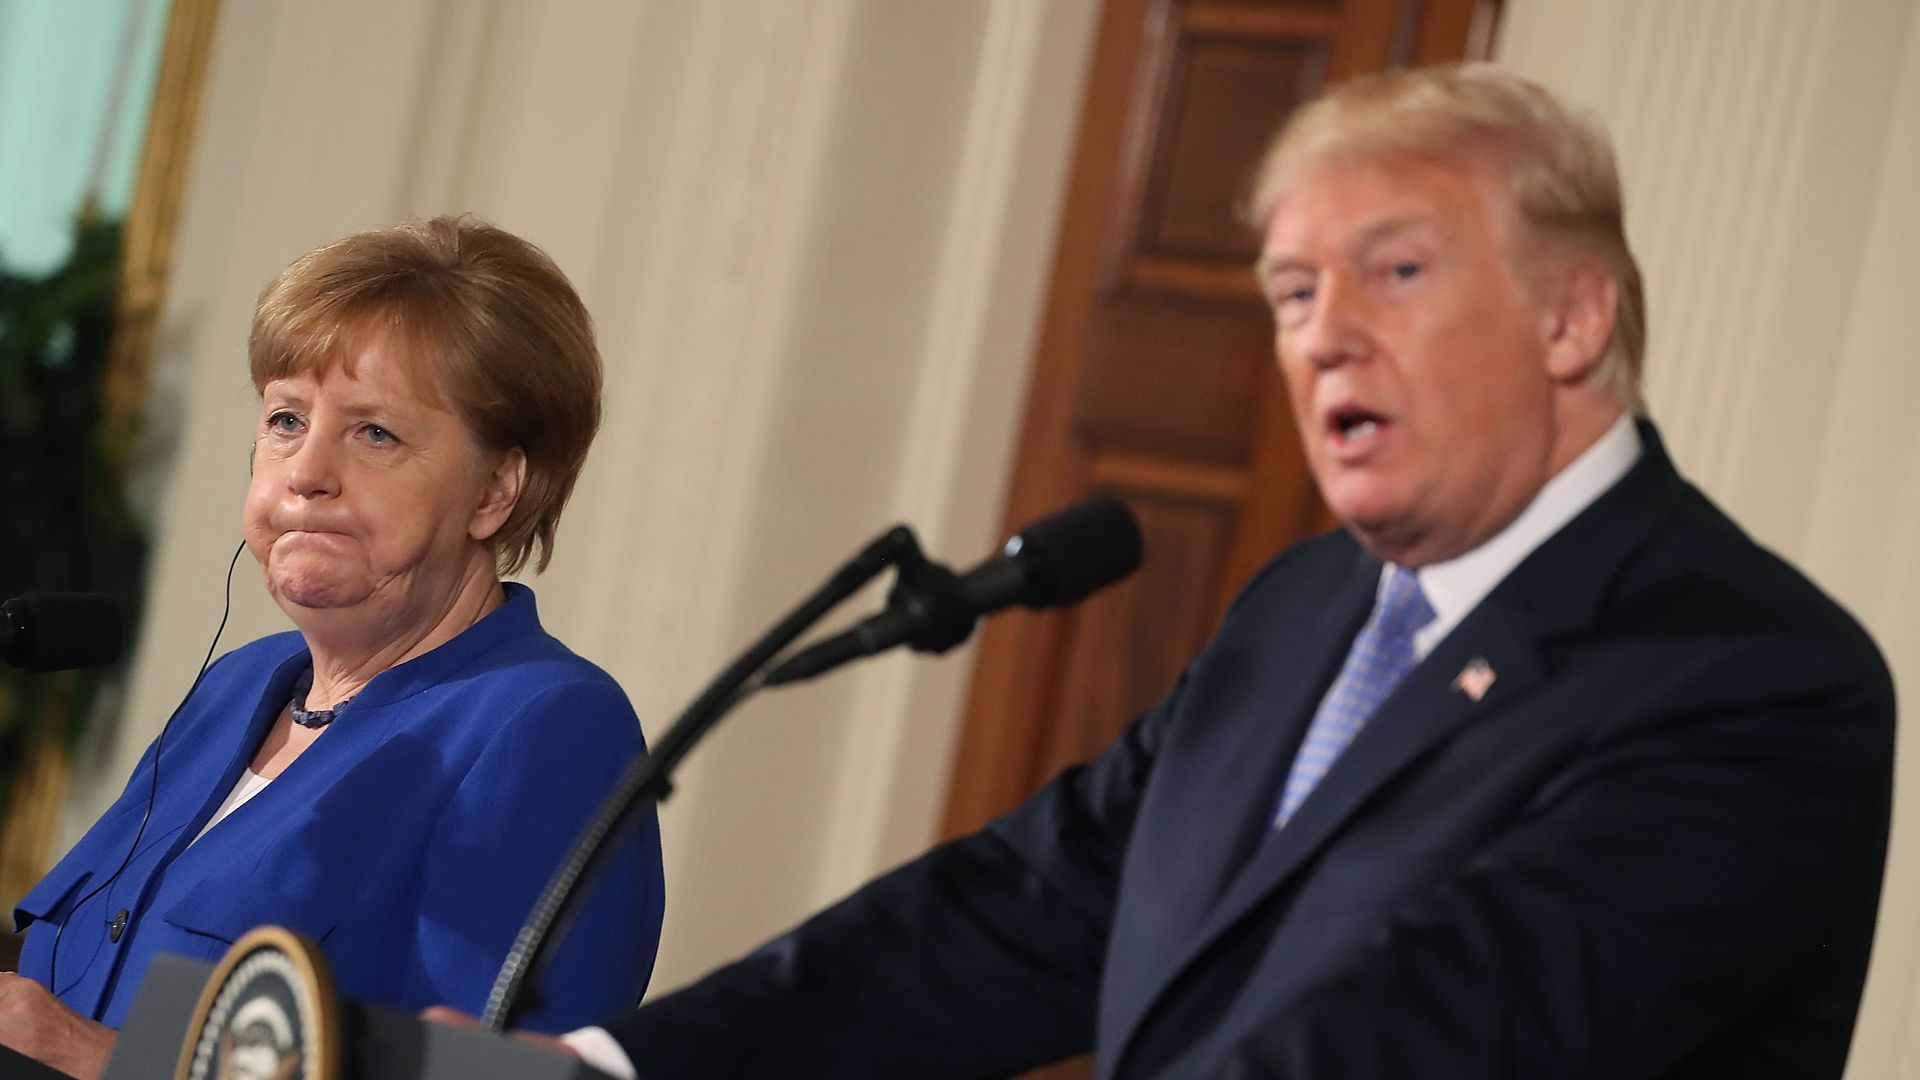 Angela Merkel puffs out her cheeks looking sideways at Trump.